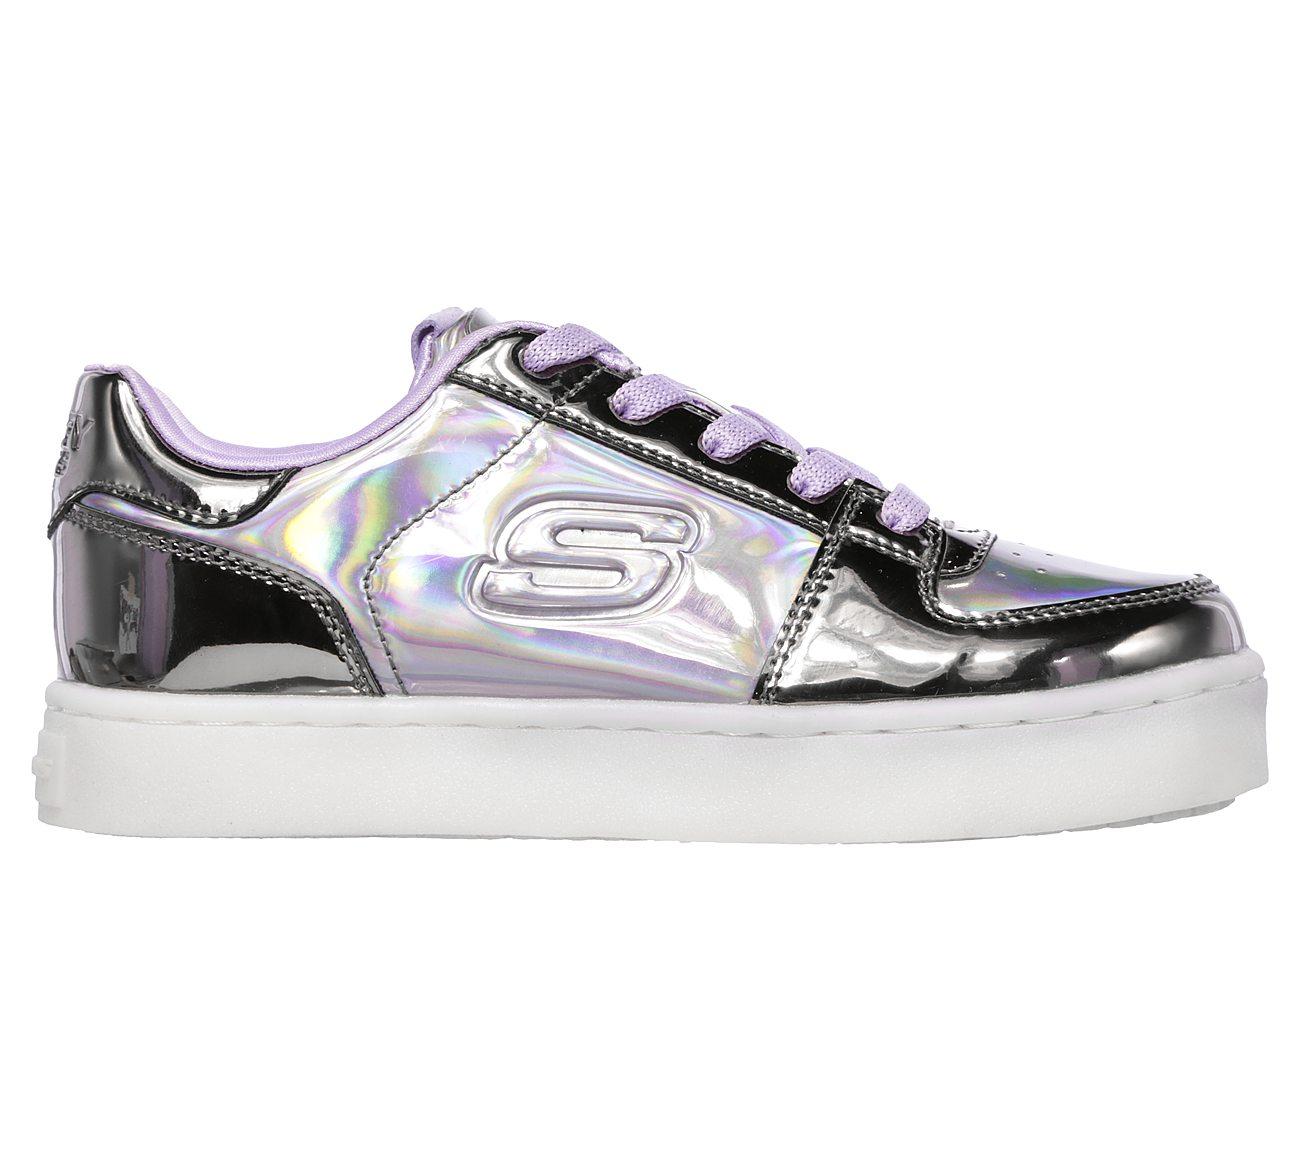 Skechers S Lights: Energy Lights Shiny Bright Sneaker (Metallic Lila GUPR)